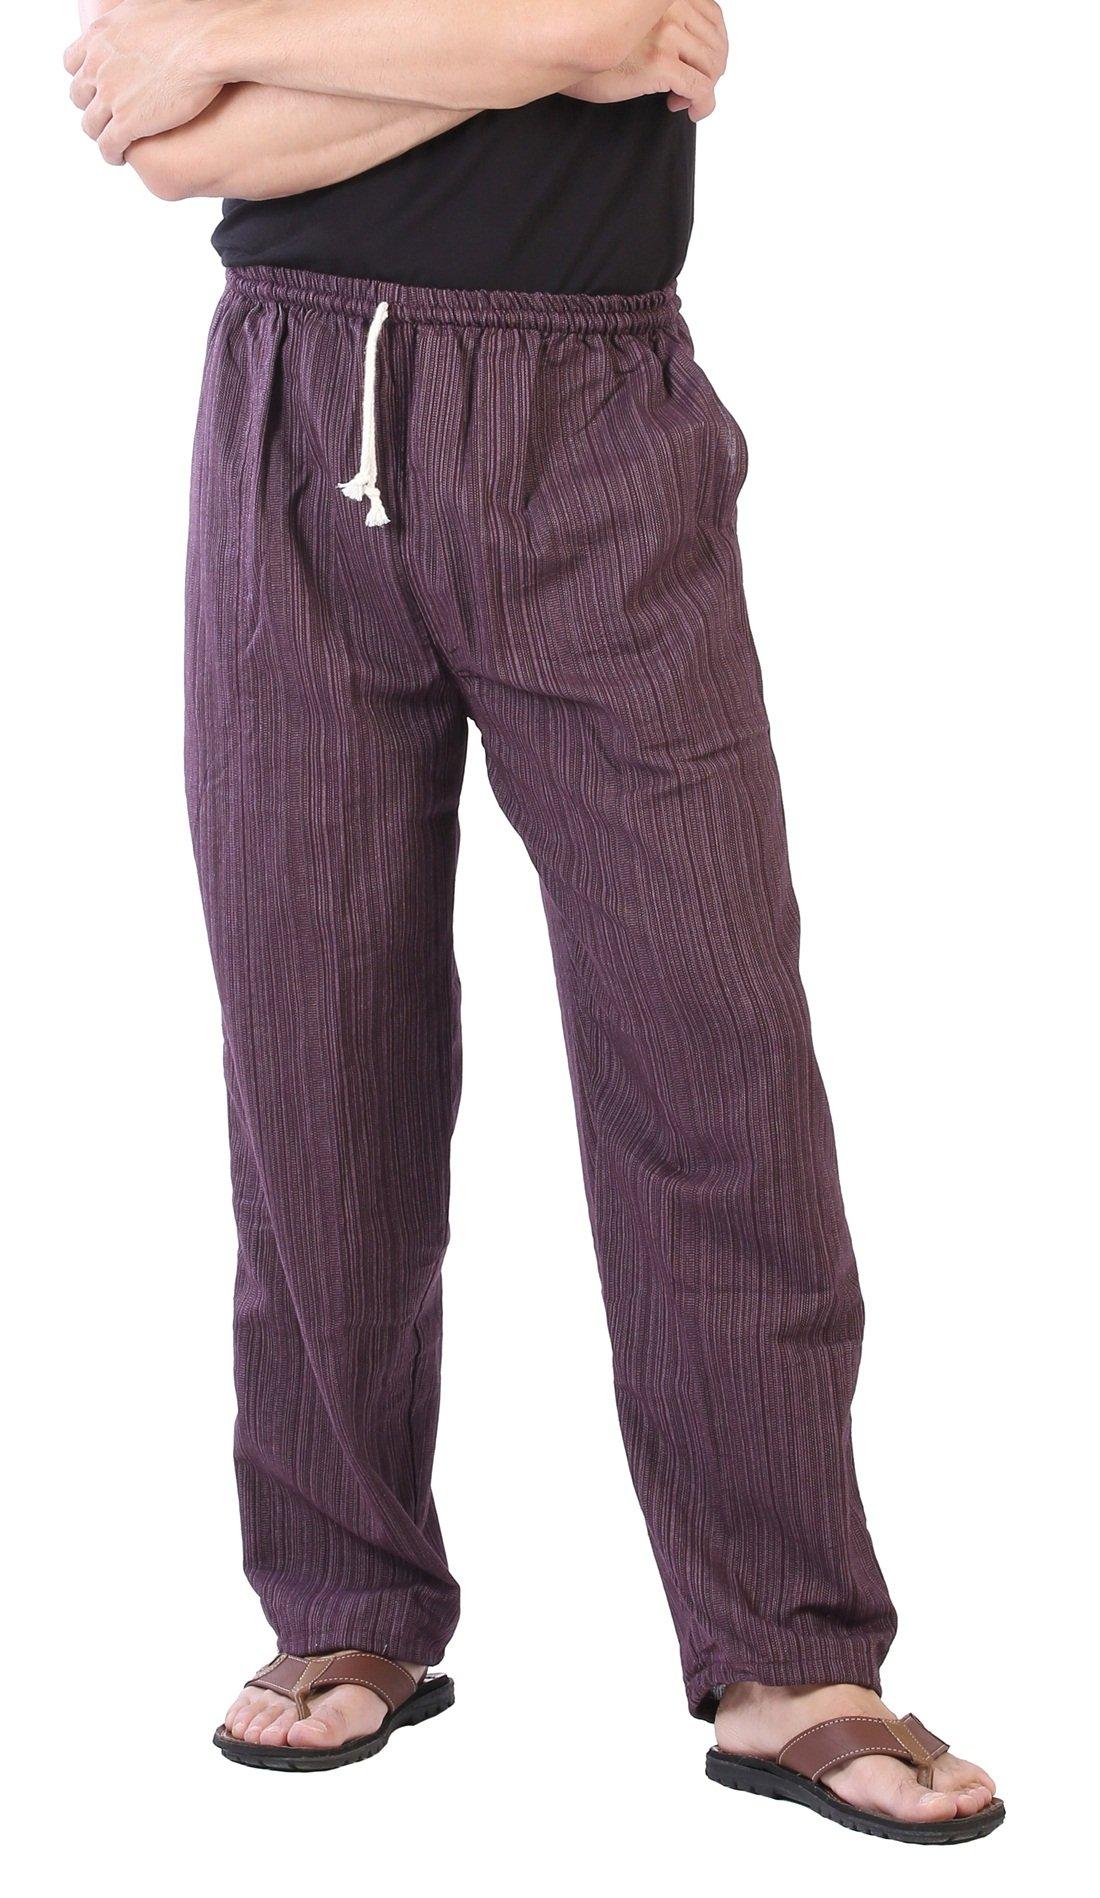 CandyHusky Pin Stripes Cotton Joggers Pajama Yoga Pants Elasticed Waist Drawstring (Dark Purple)